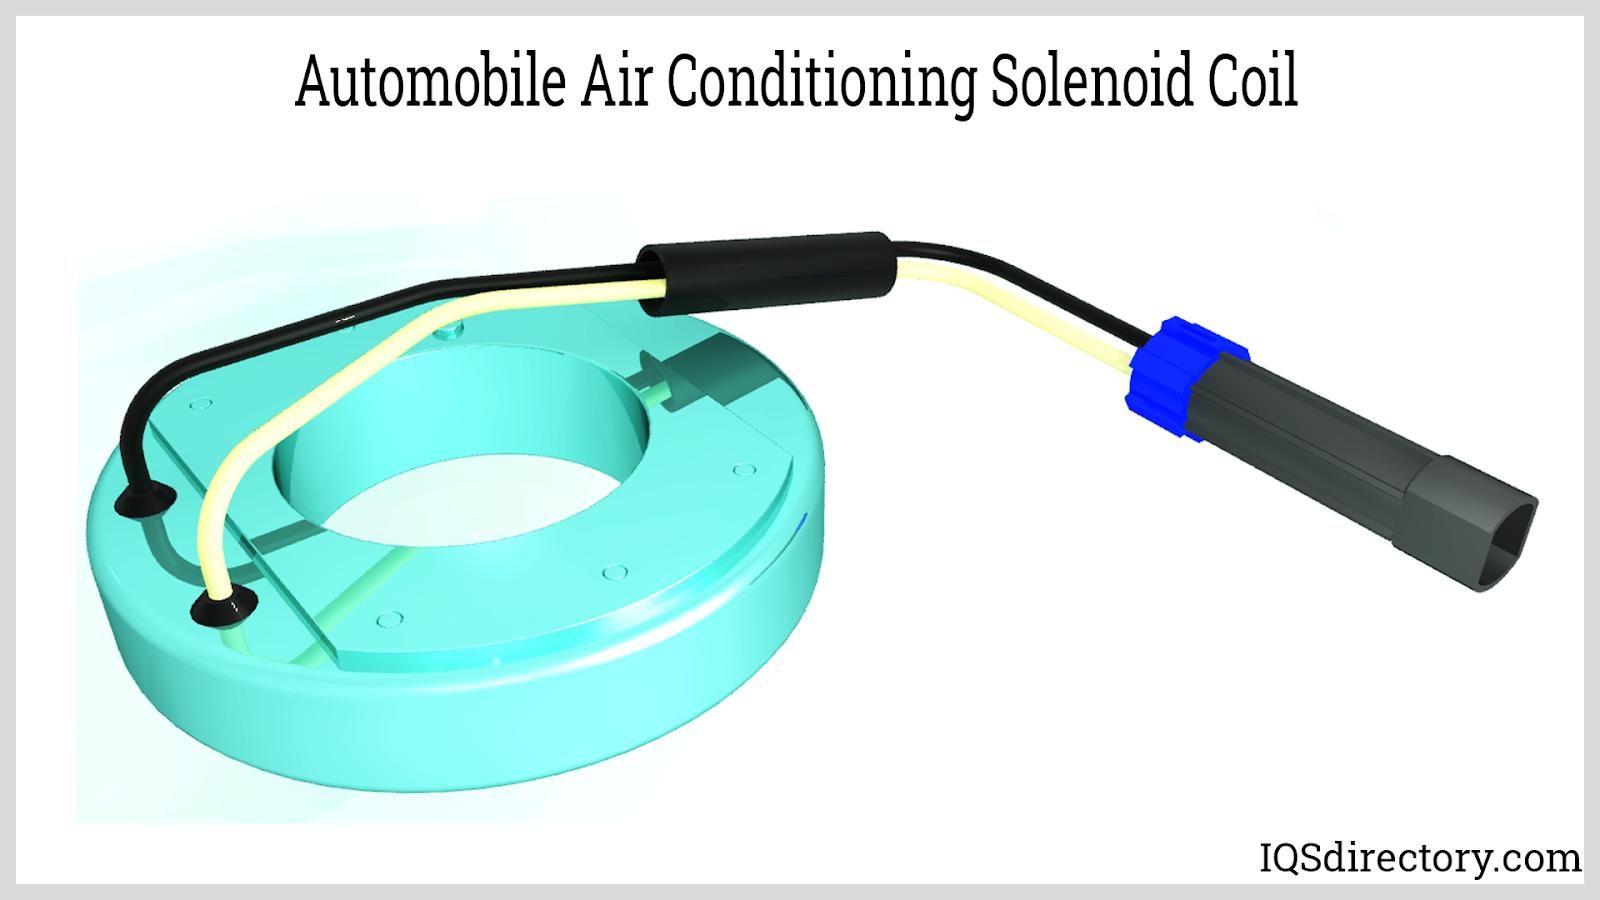 Automobile Air Conditioning Solenoid Coil